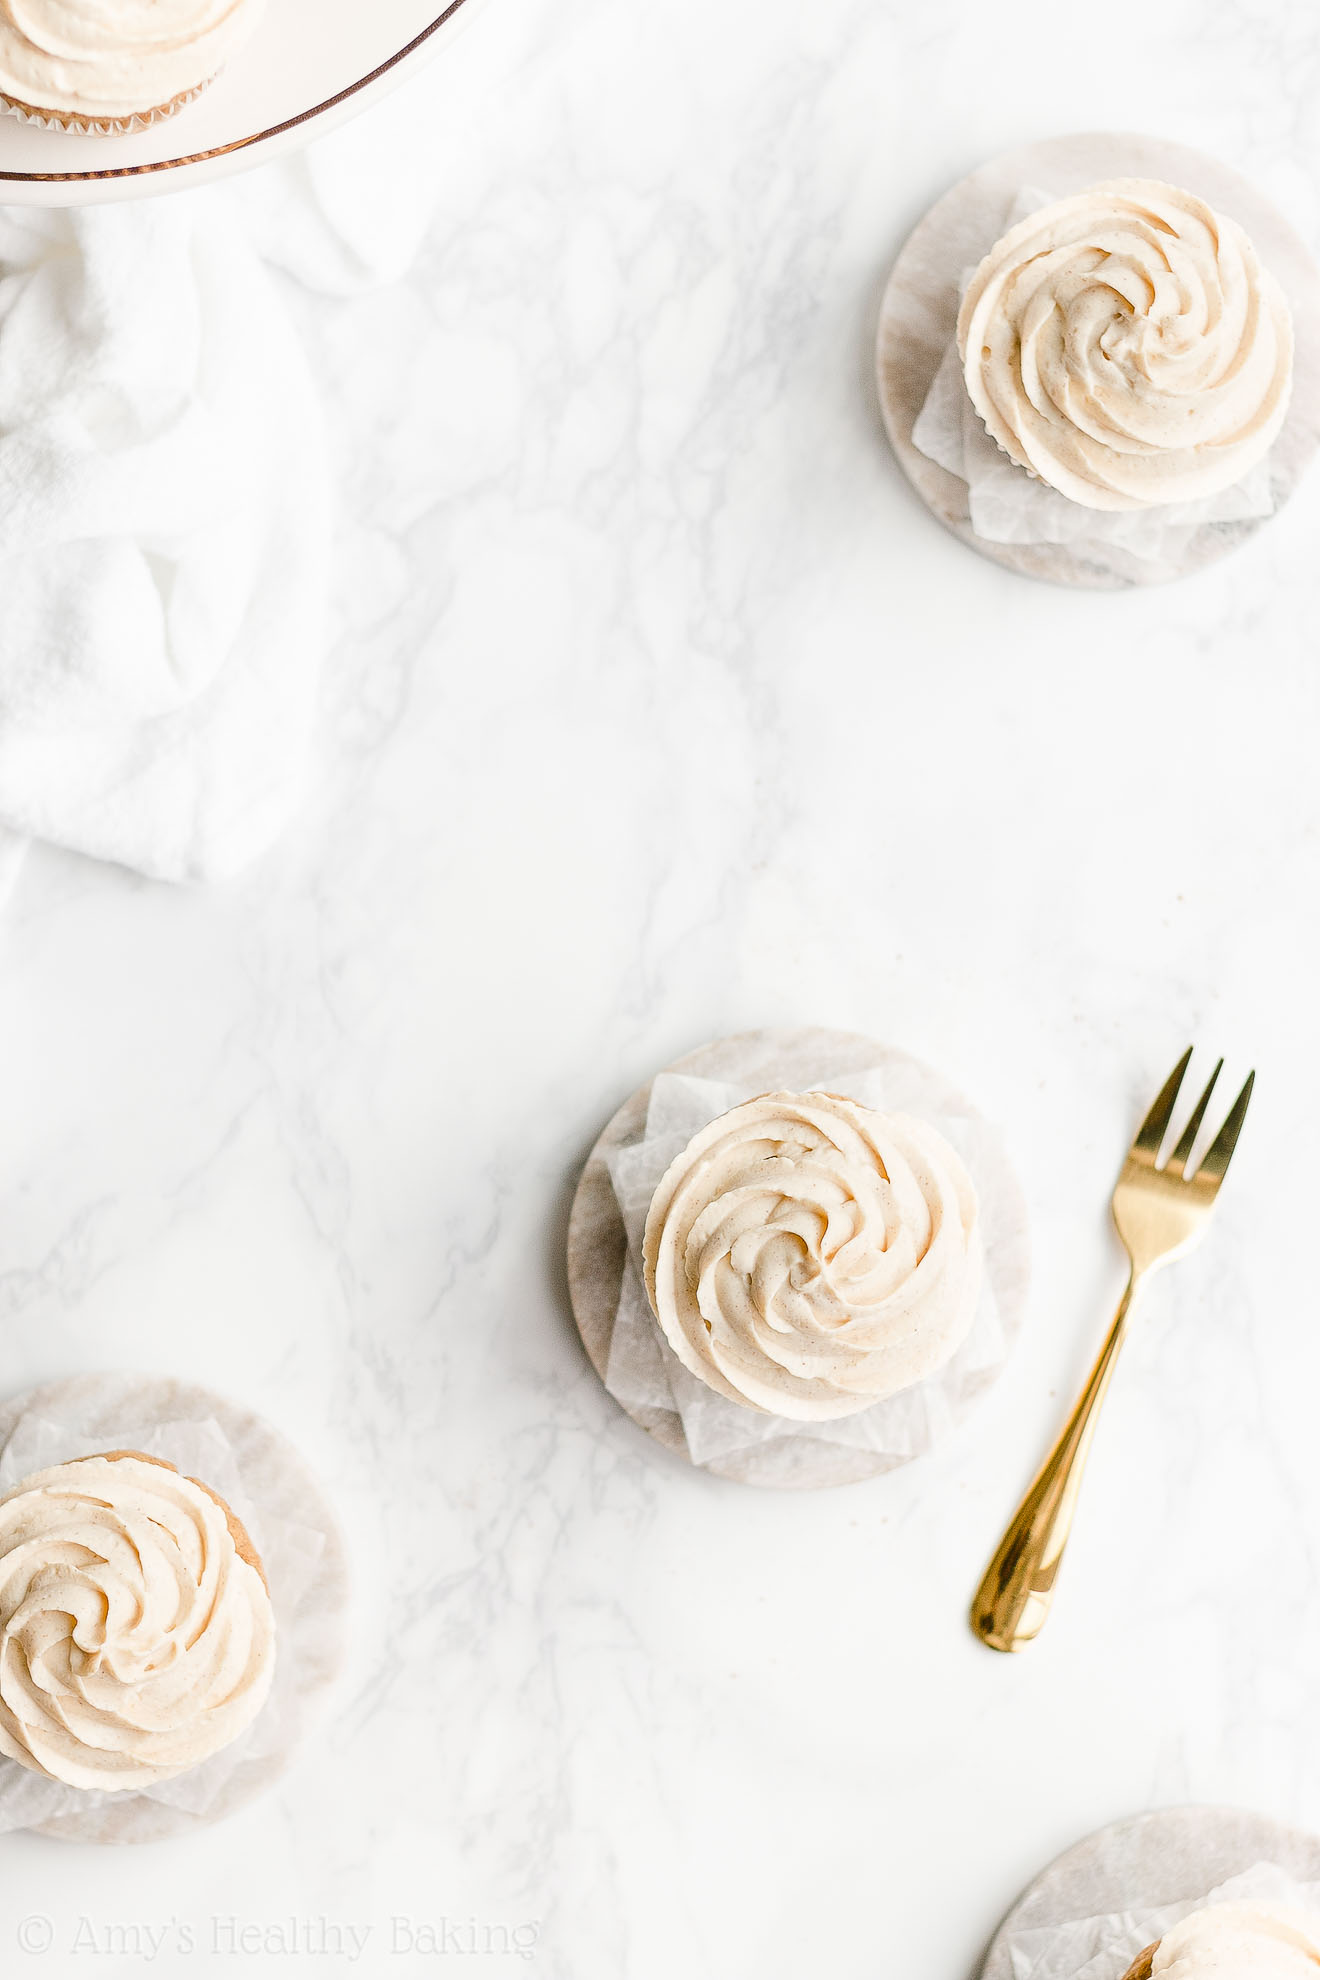 Healthy Eggnog Cupcakes with High Protein Cinnamon Greek Yogurt Frosting